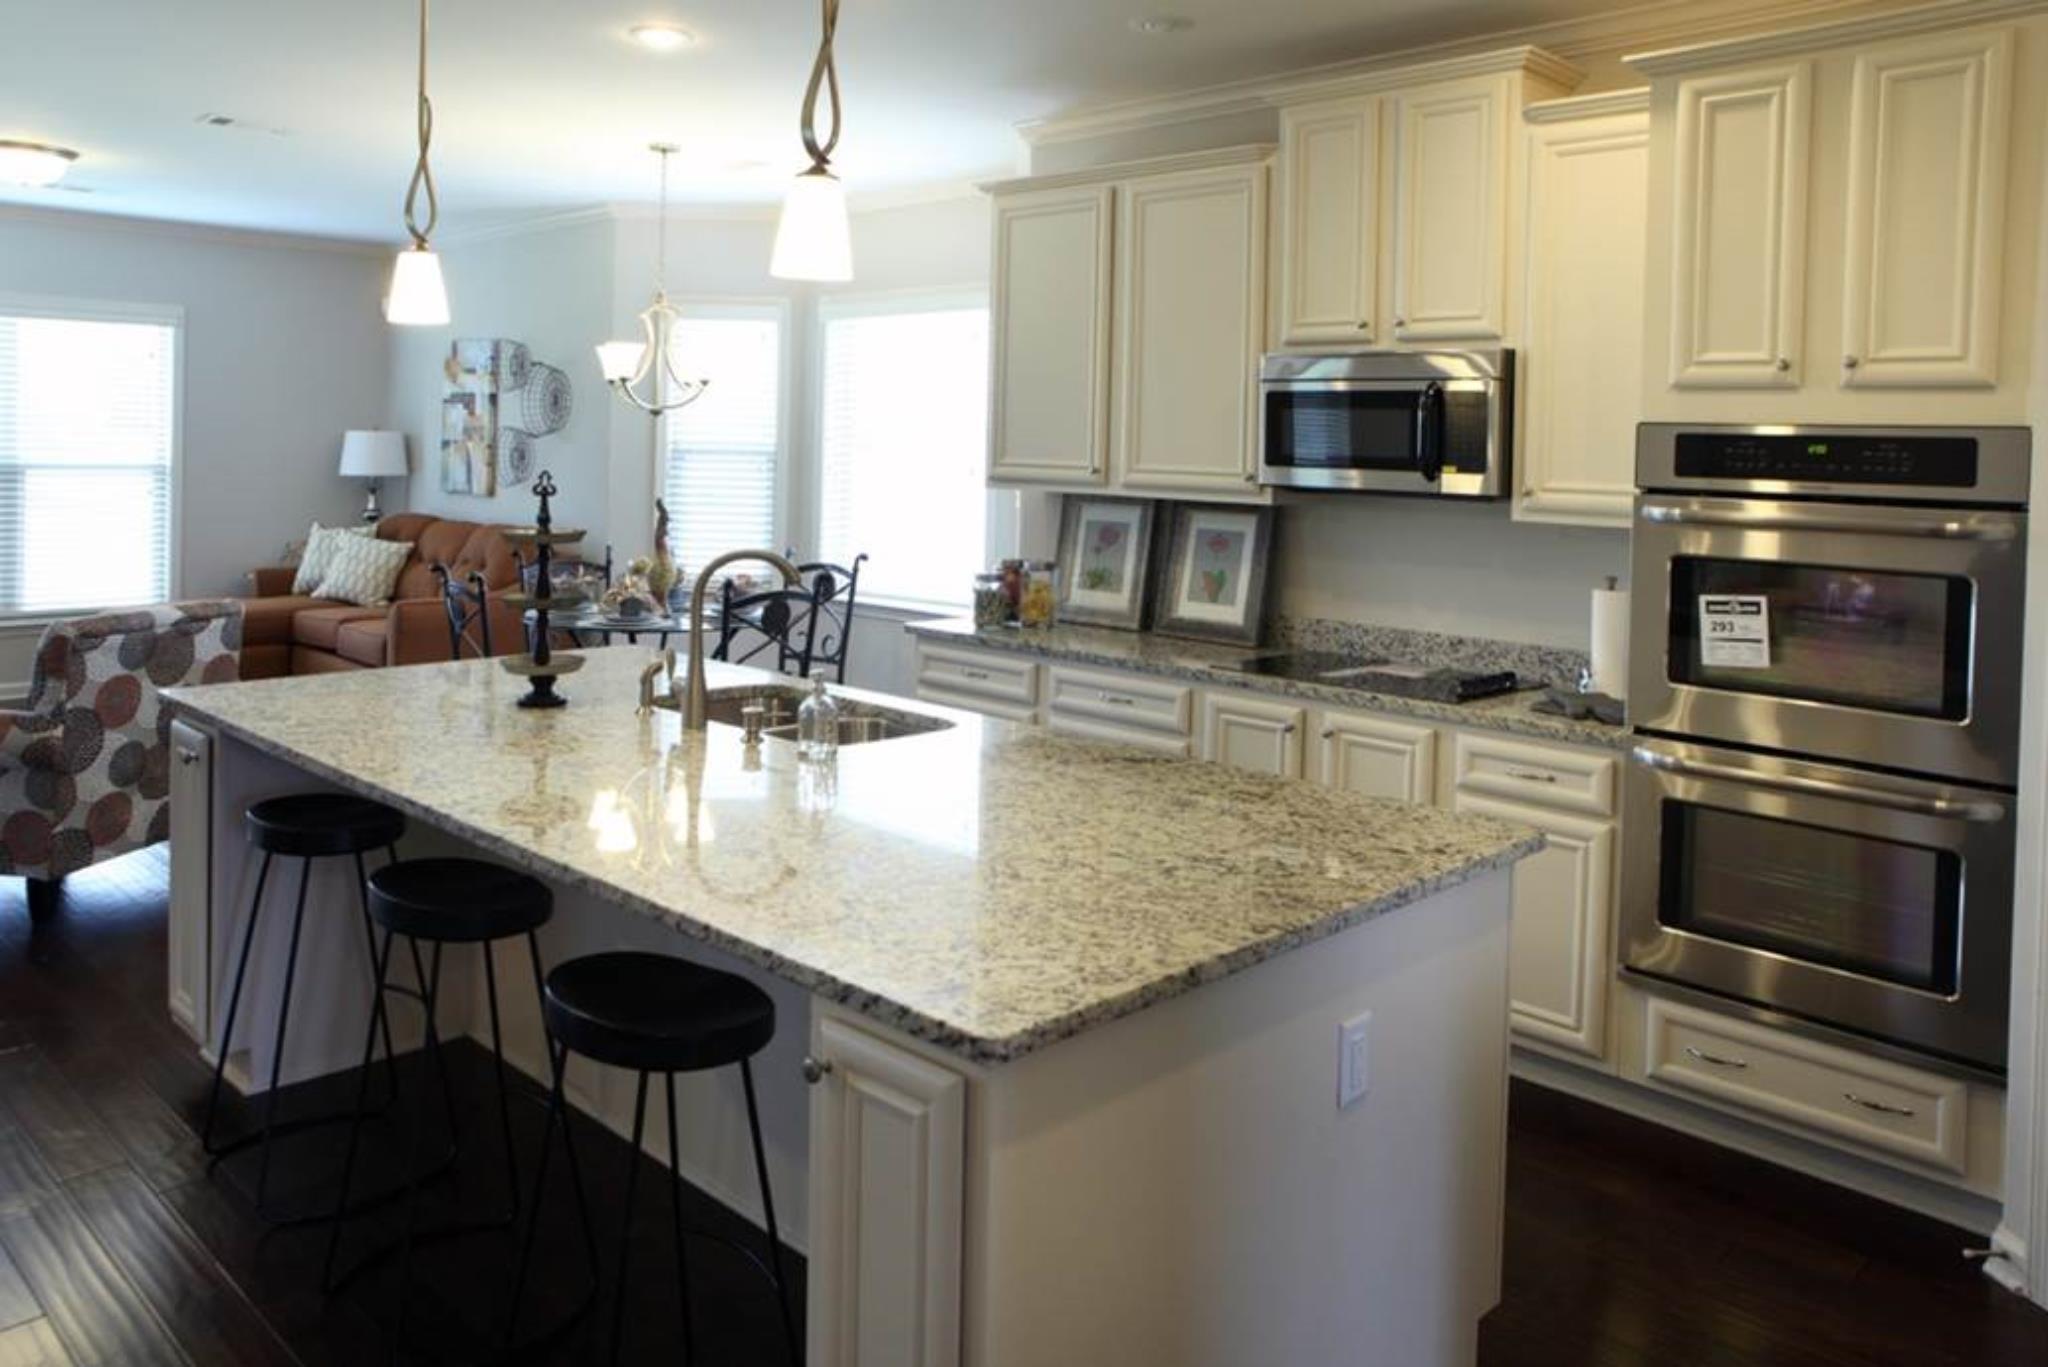 chesapeake kitchen design. Chesapeake Kitchen Design